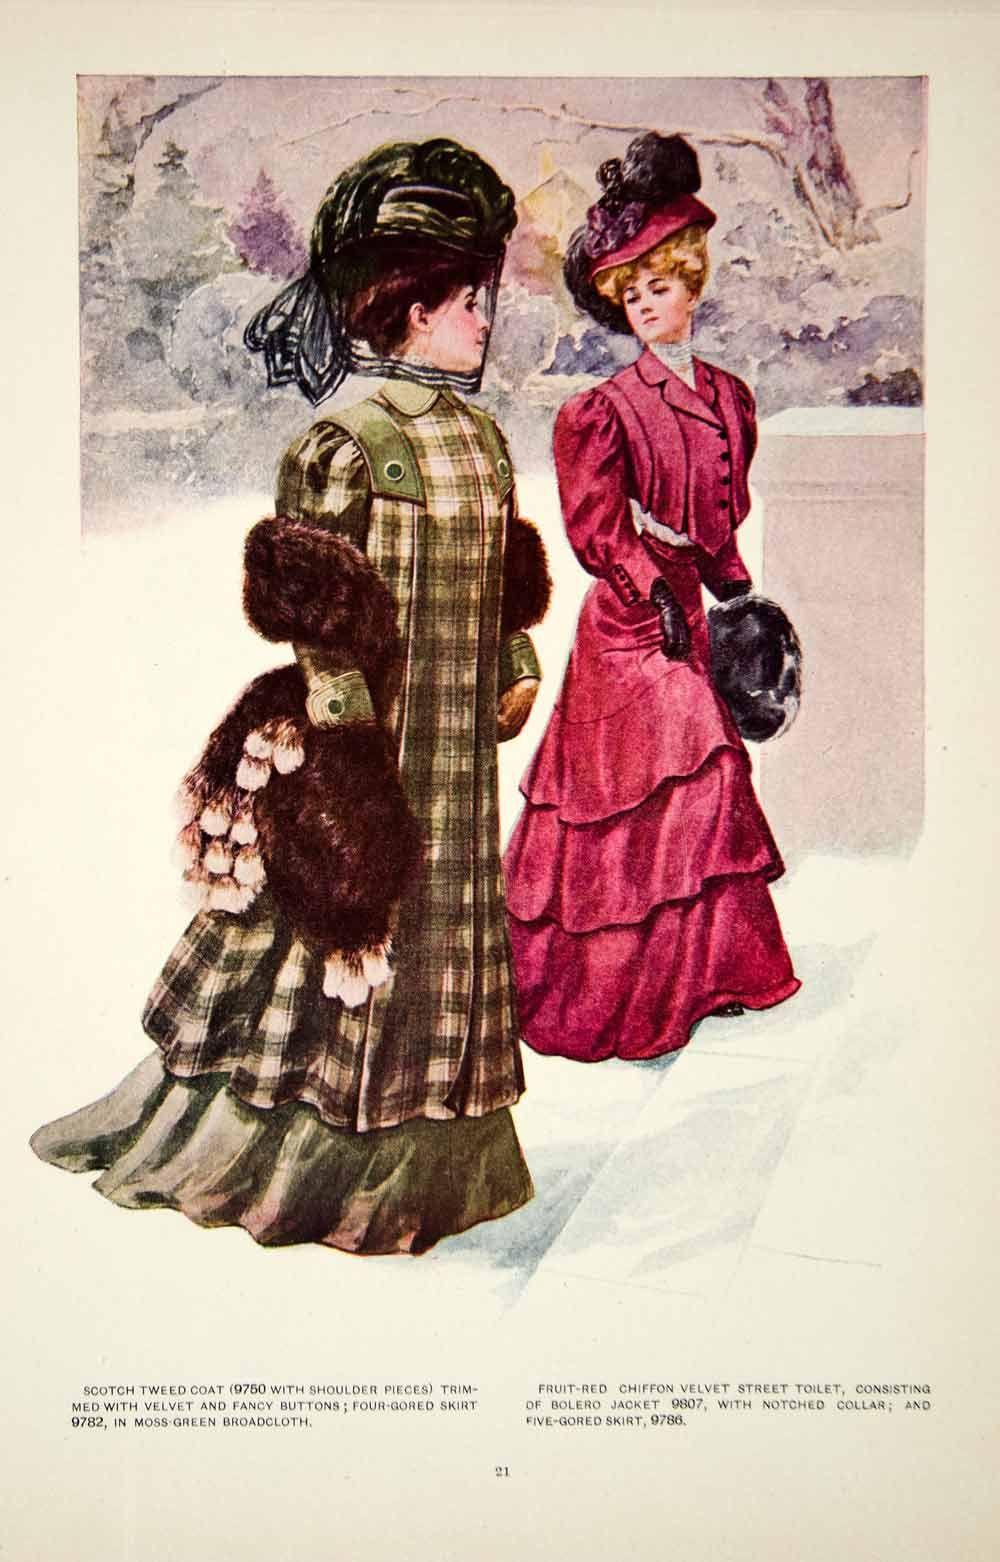 c1bff90144d 1907 Color Print Fashion Costume Clothing Dress Edwardian Women Hat ...